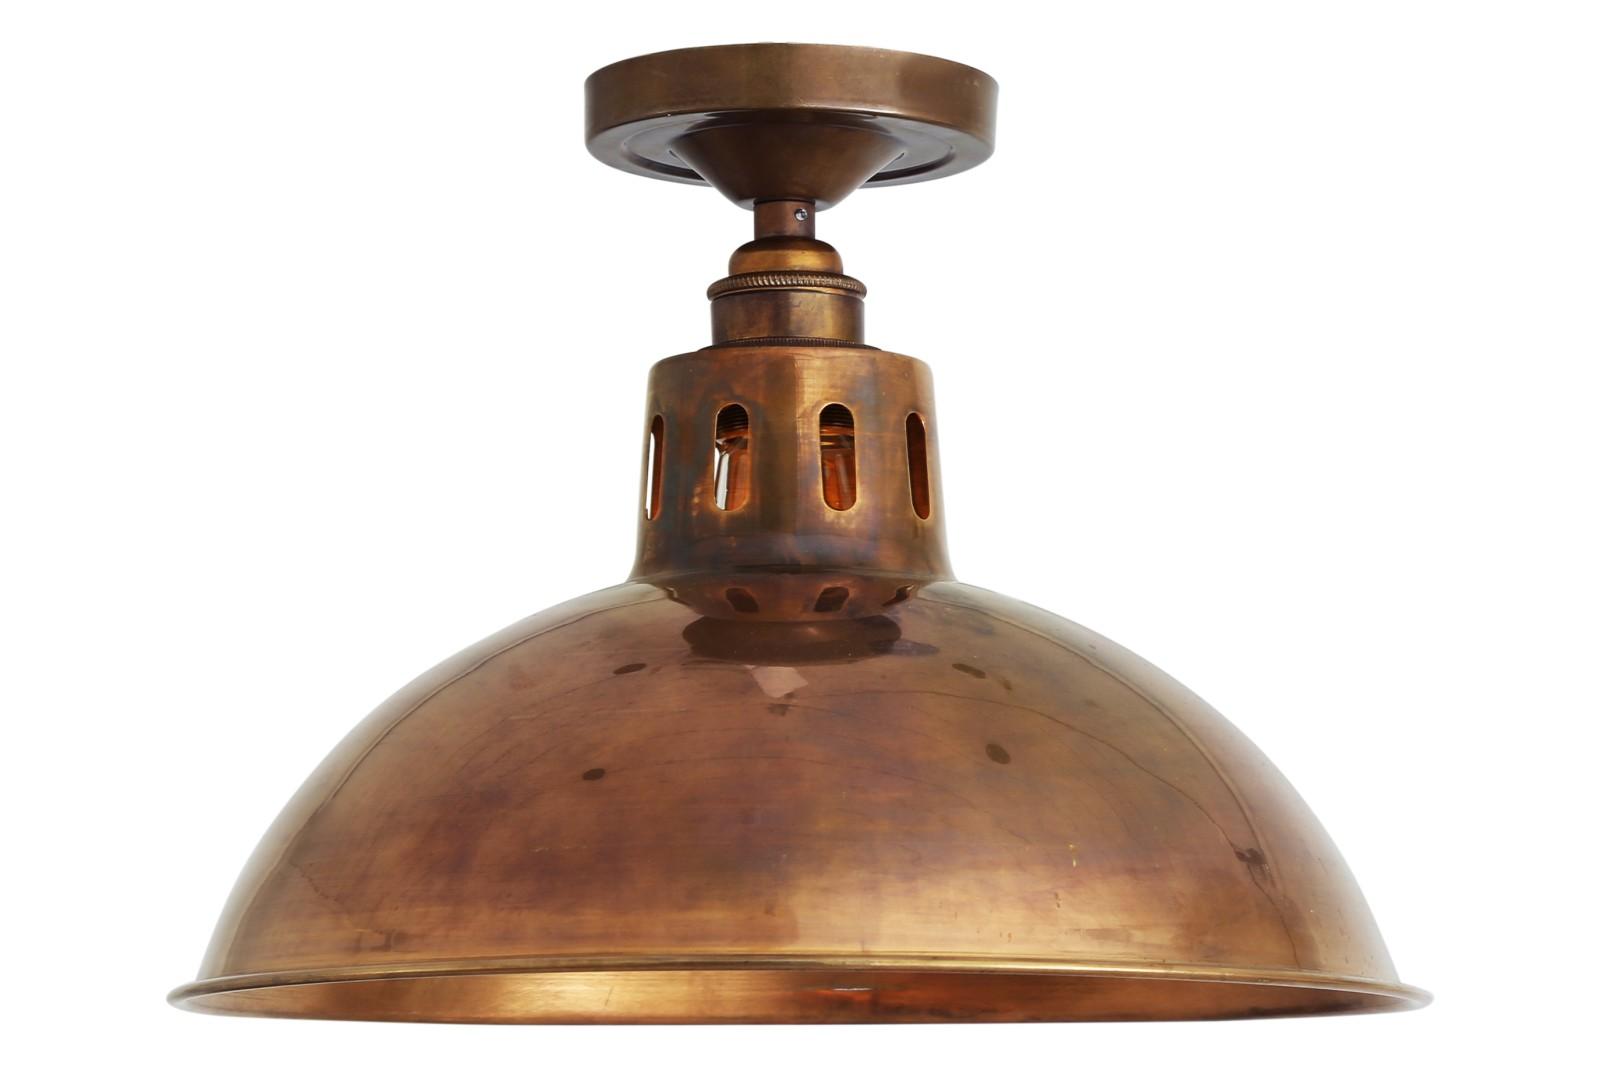 Paris Ceiling Light Antique Brass